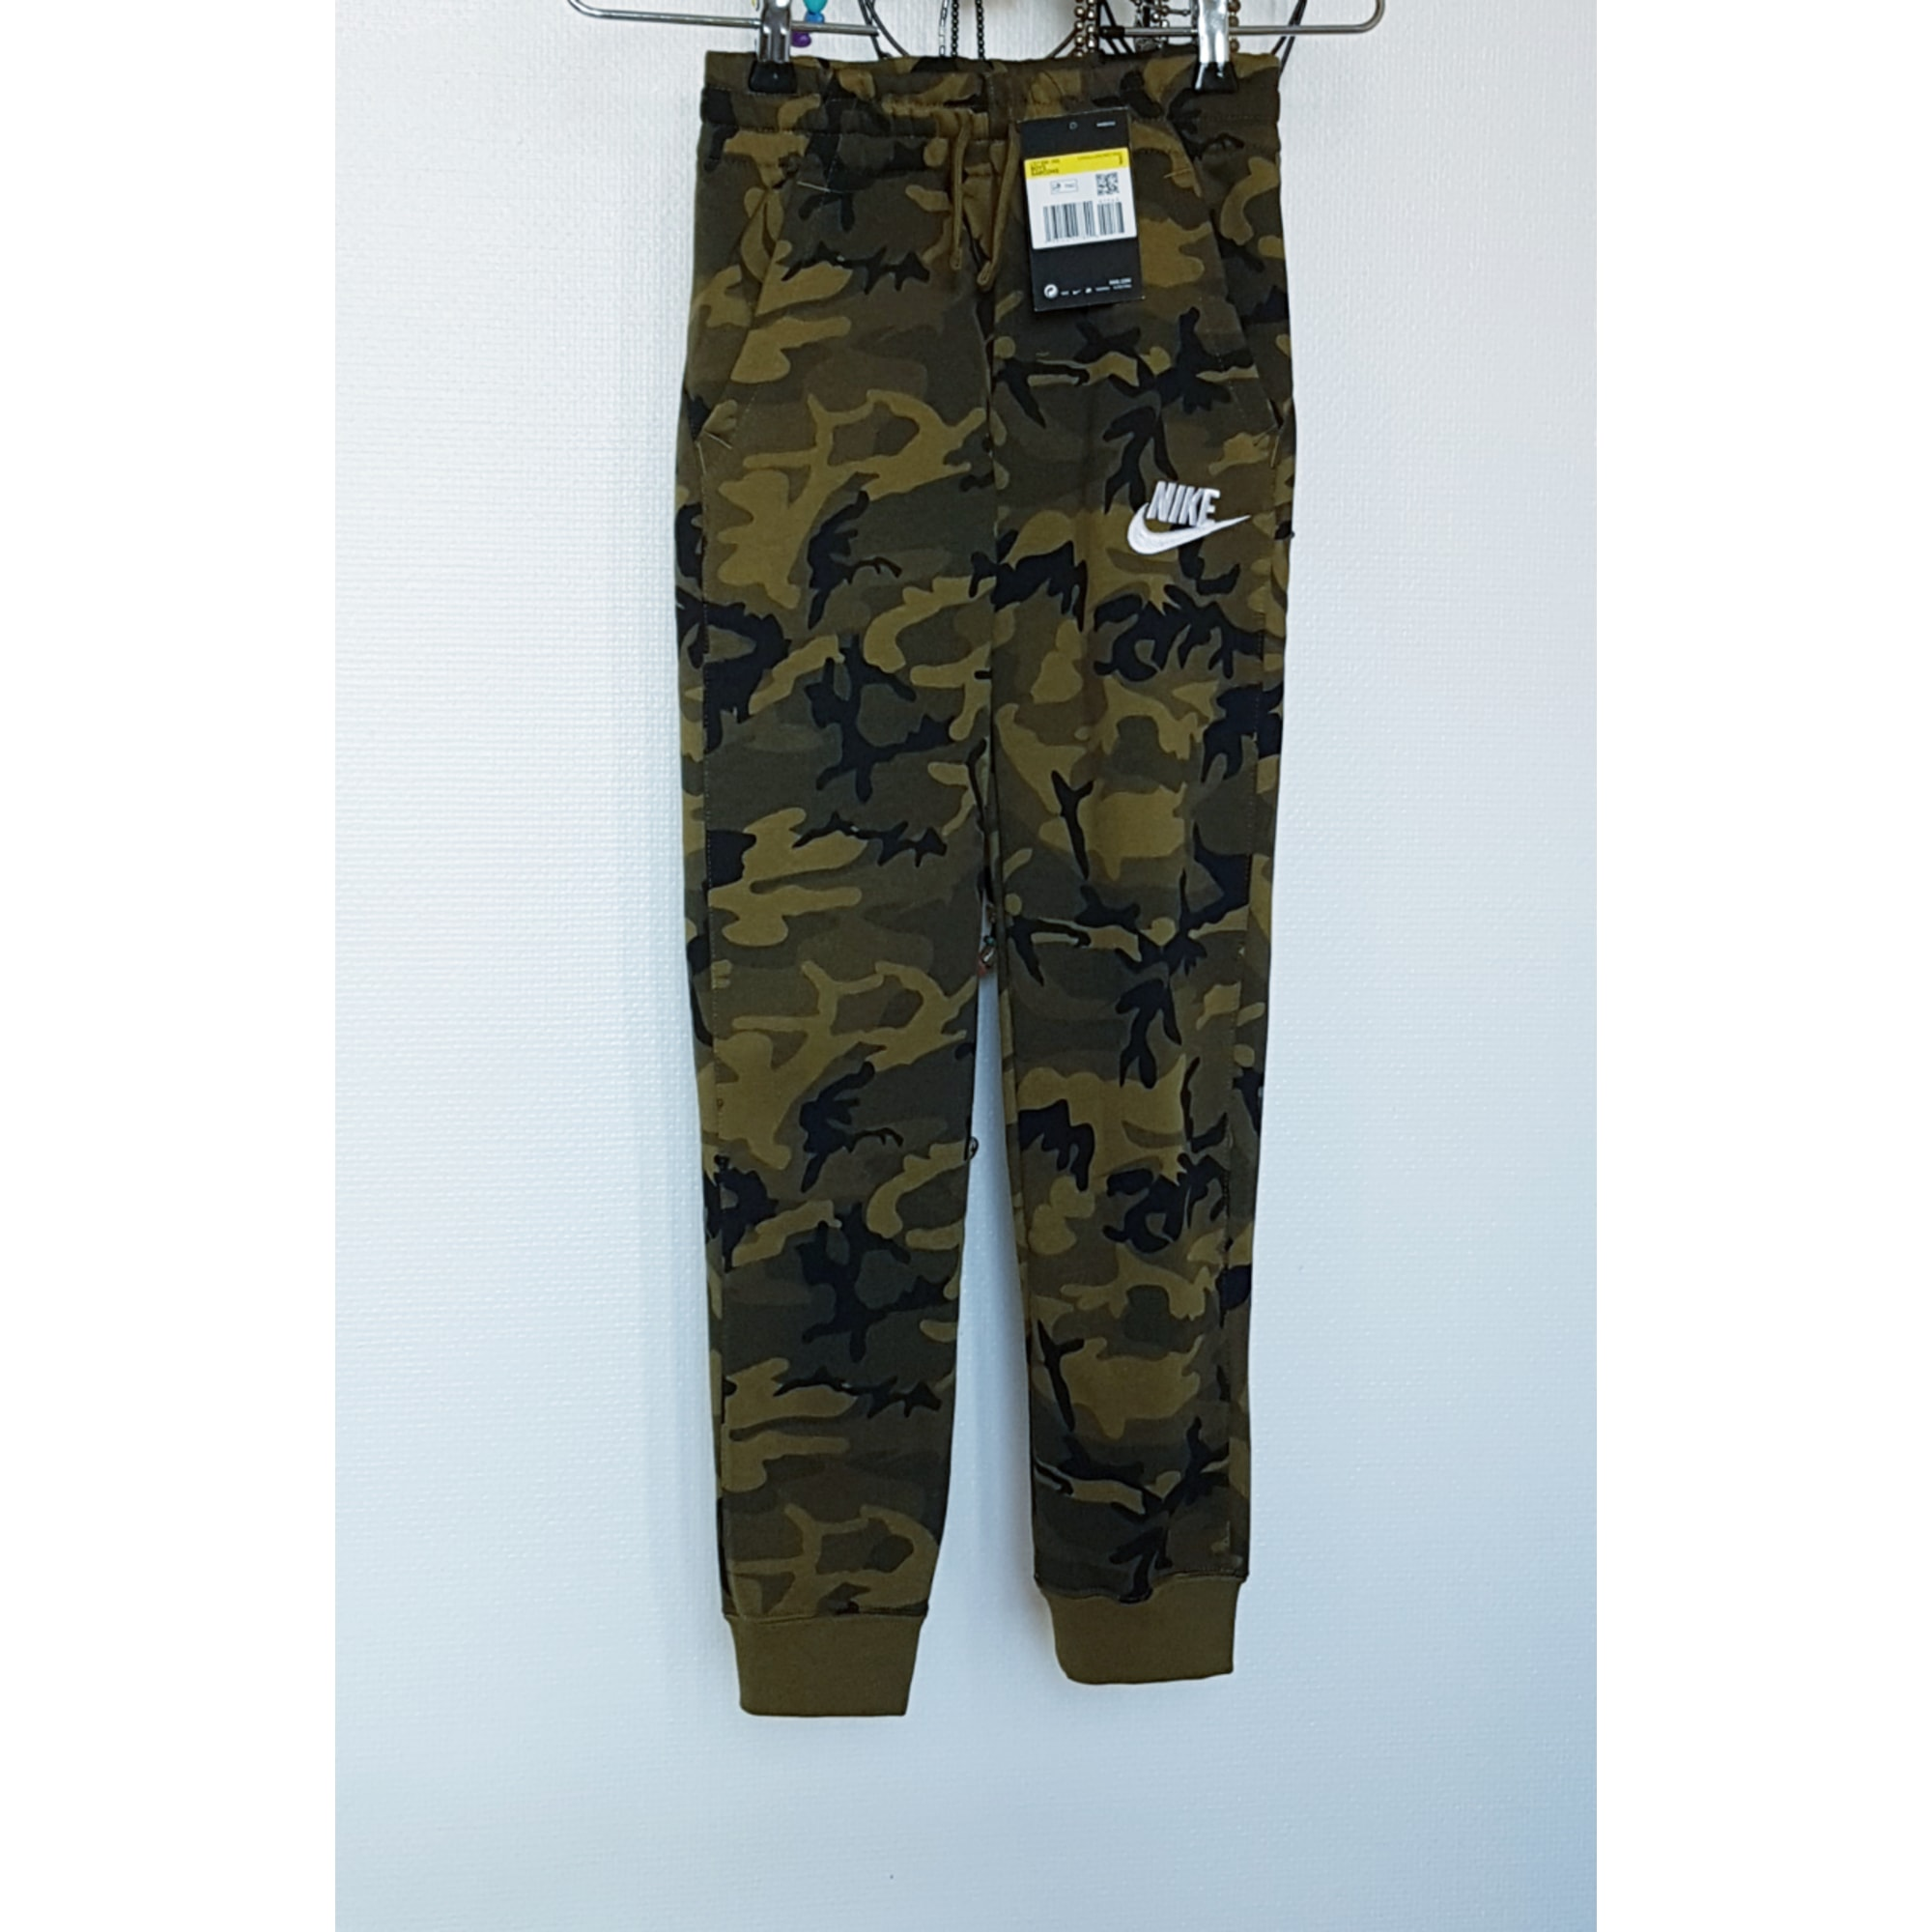 Pantalon de survêtement NIKE coton kaki 8-9